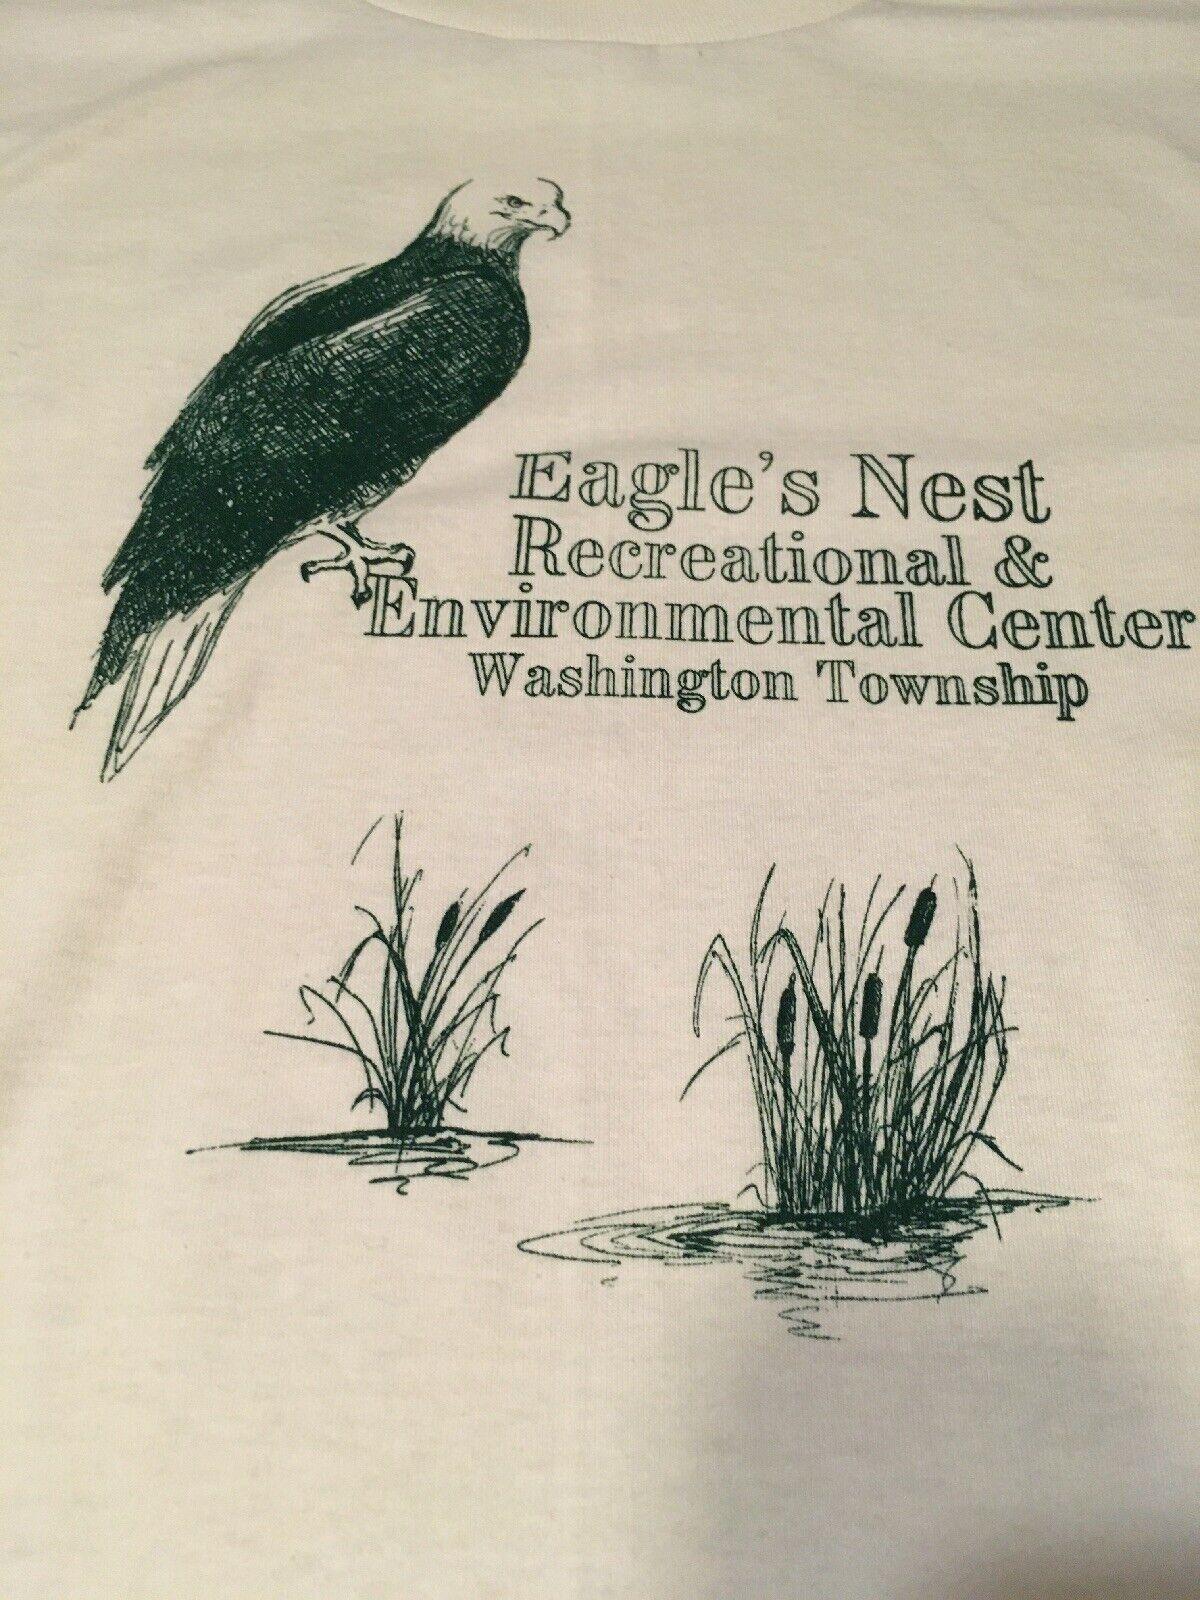 Eagles Nest Recreational & Enviromental Center Wa… - image 1